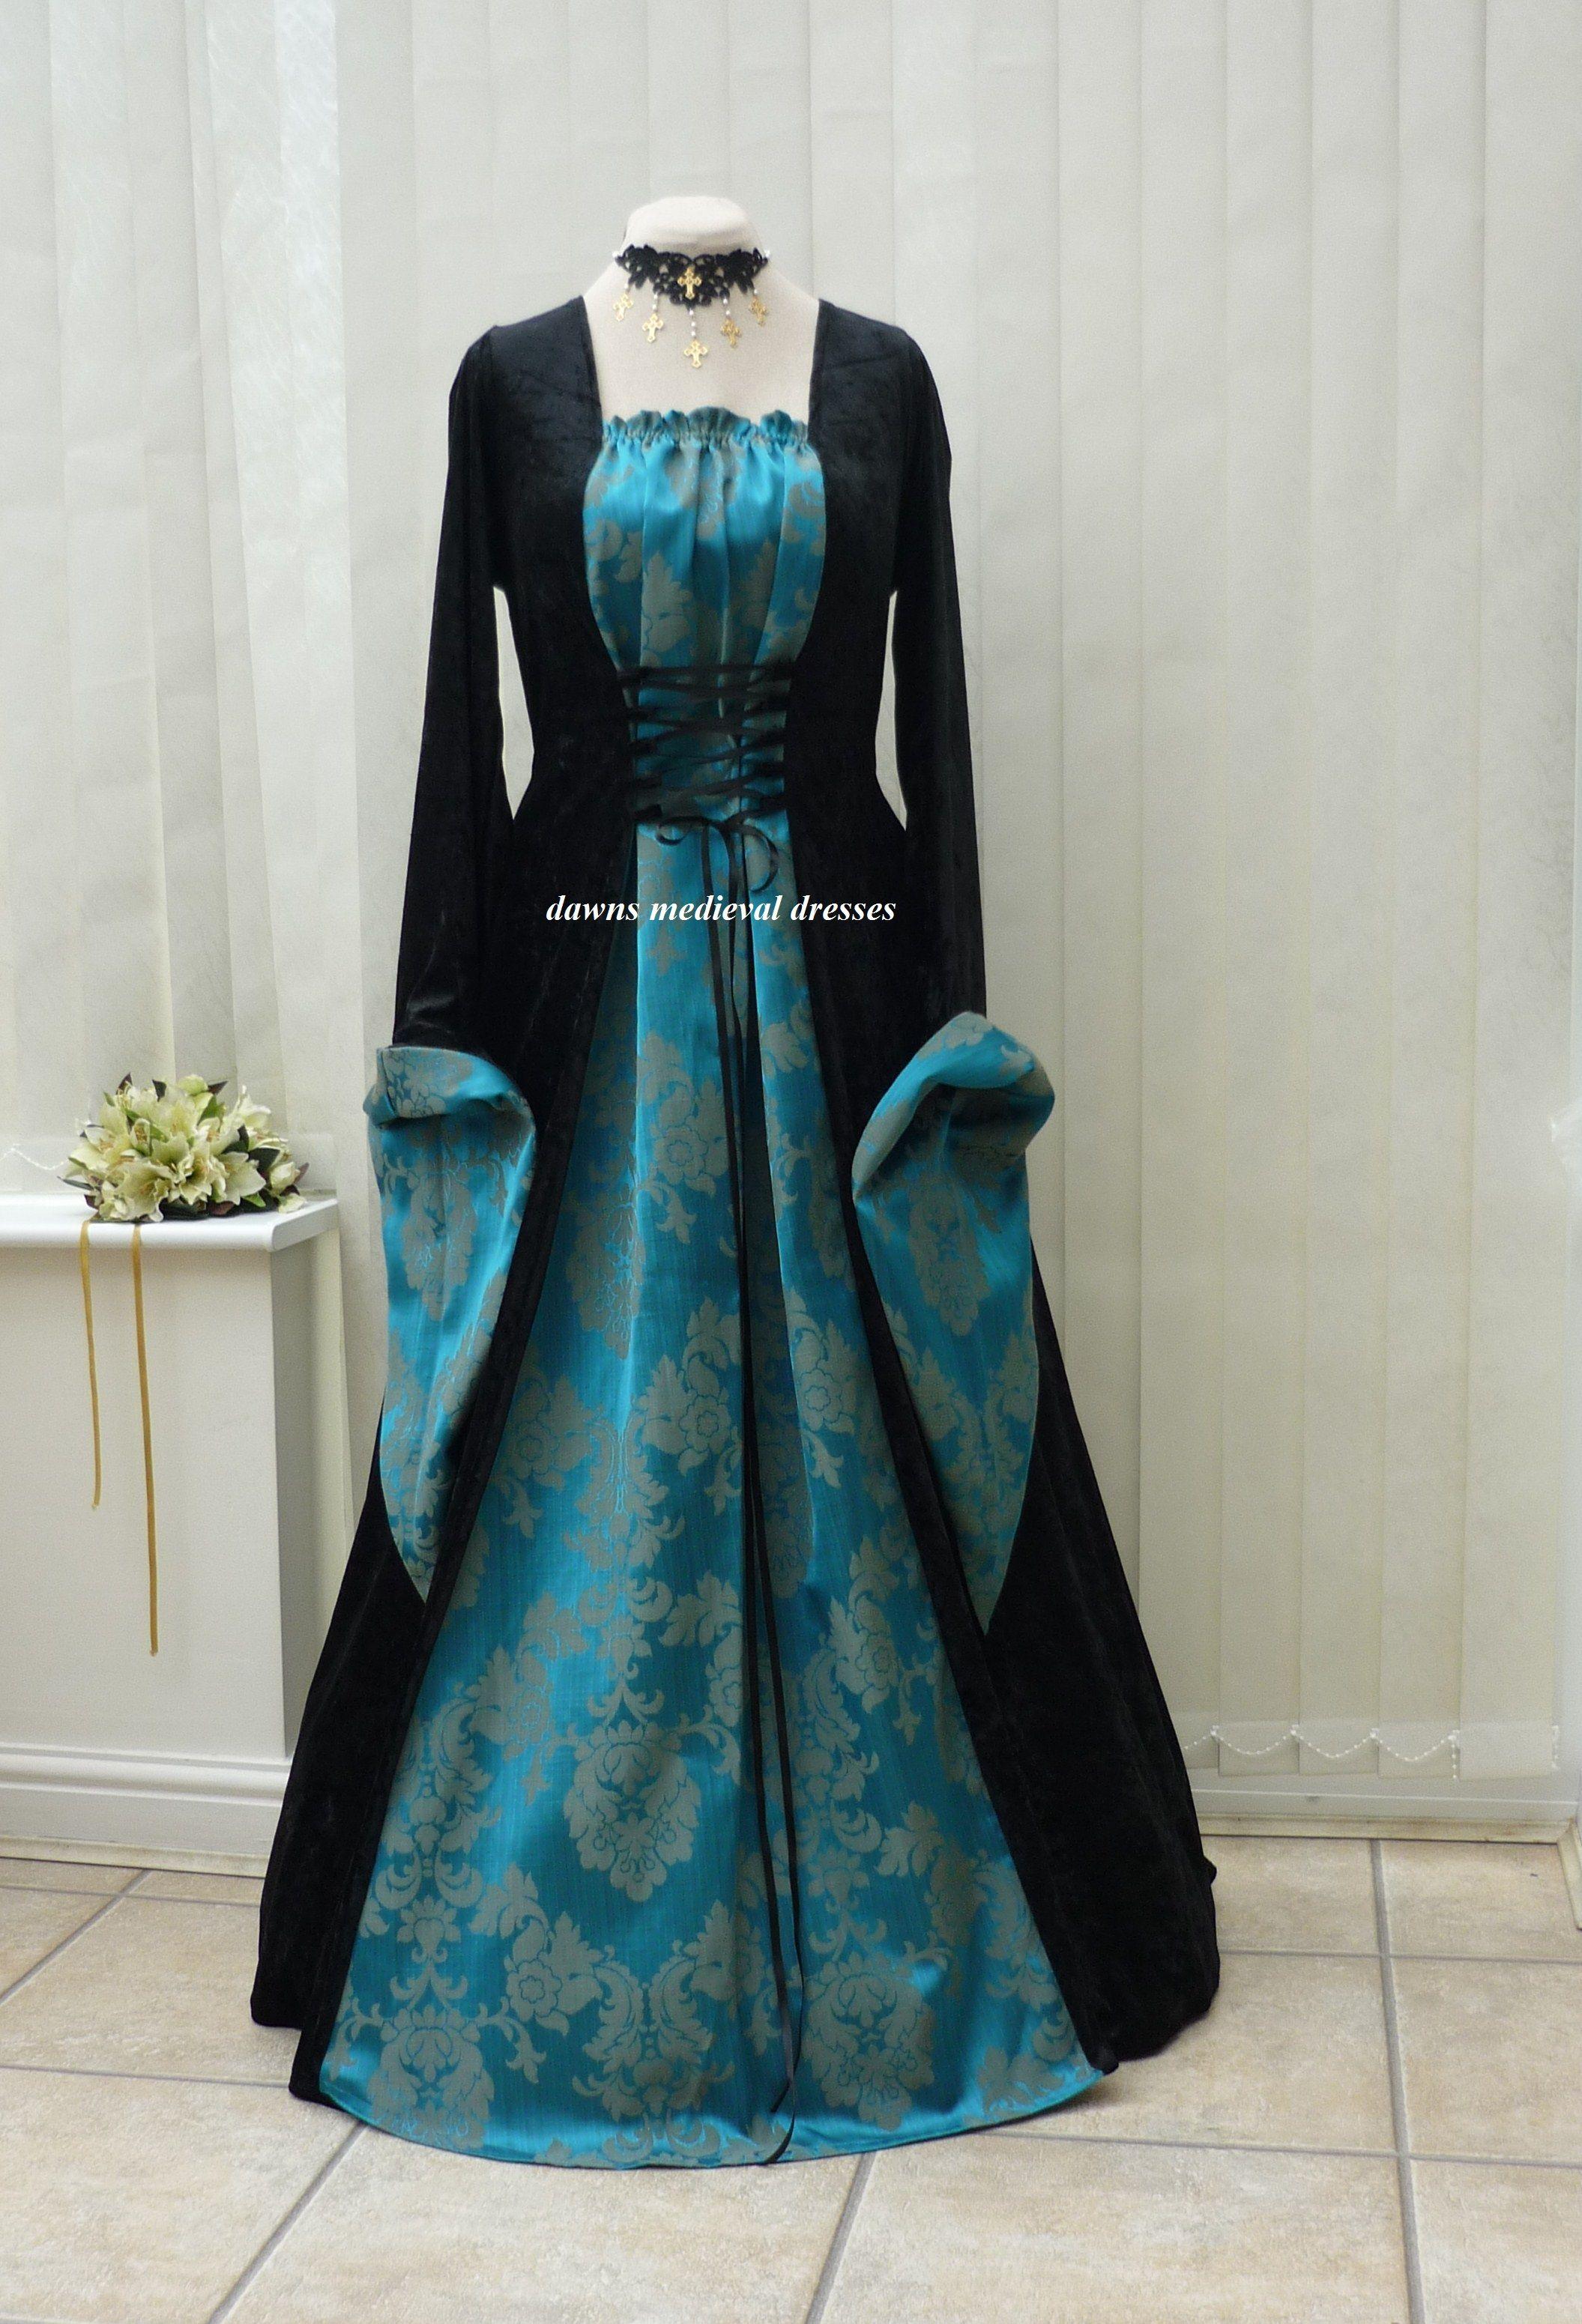 Medieval Gothic Black Teal Blue Dress | Gowns | Pinterest | Teal ...